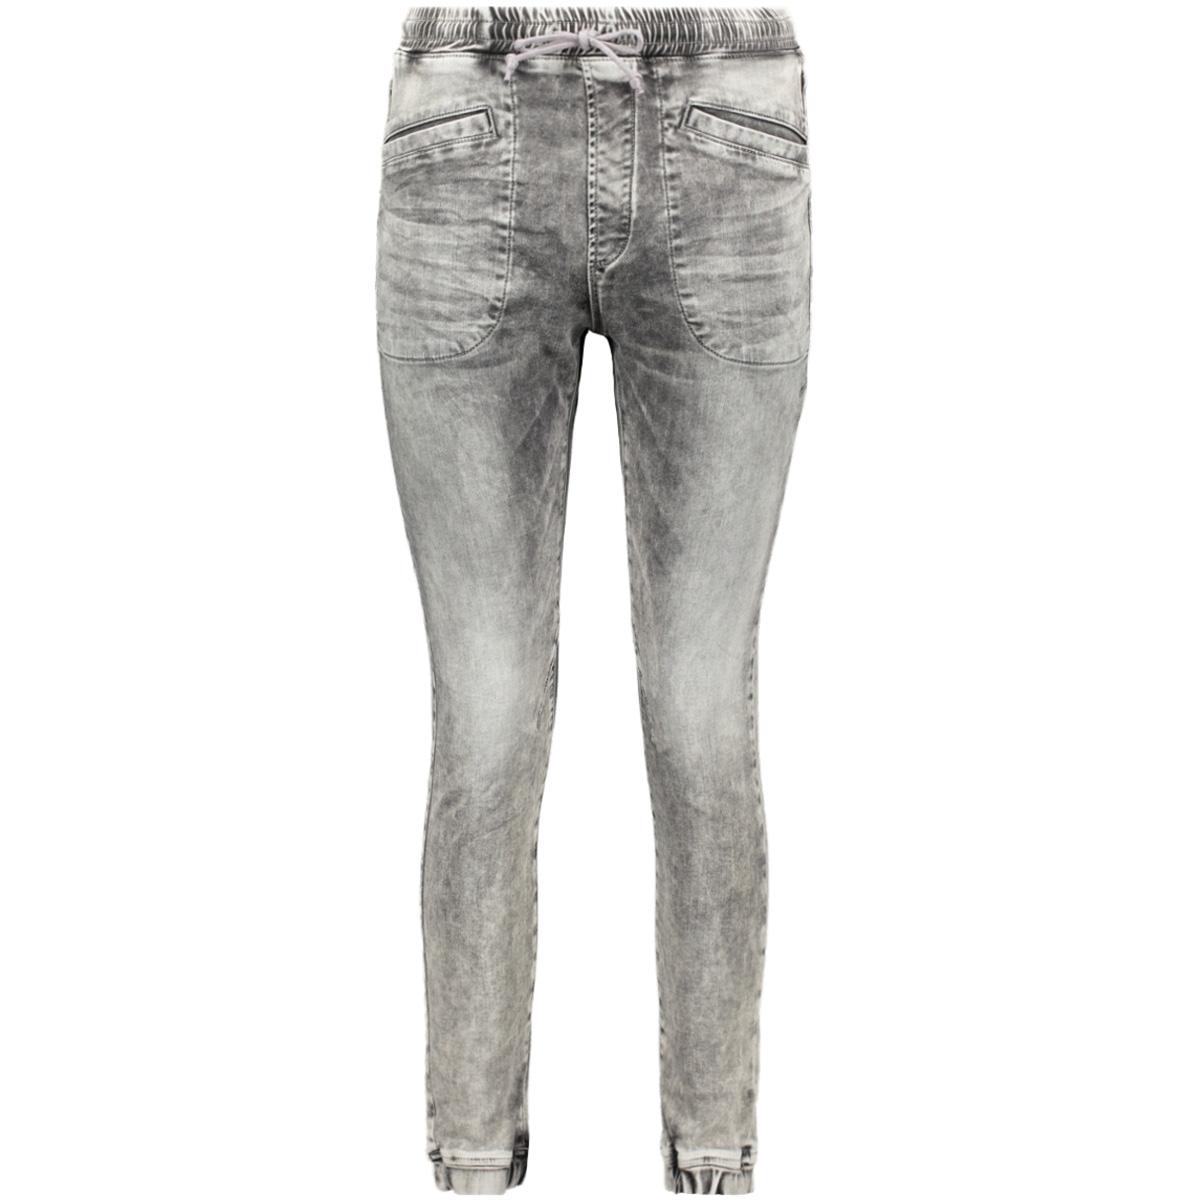 debby 1009 5116 13593 ltb jeans 51677 enda wash